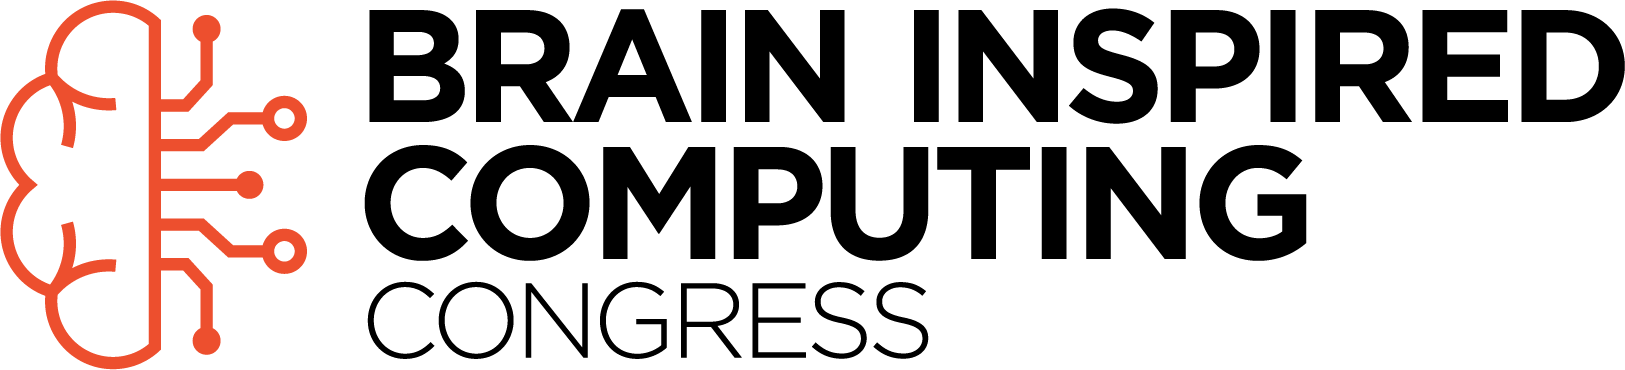 Brain Inspired computing congress logo